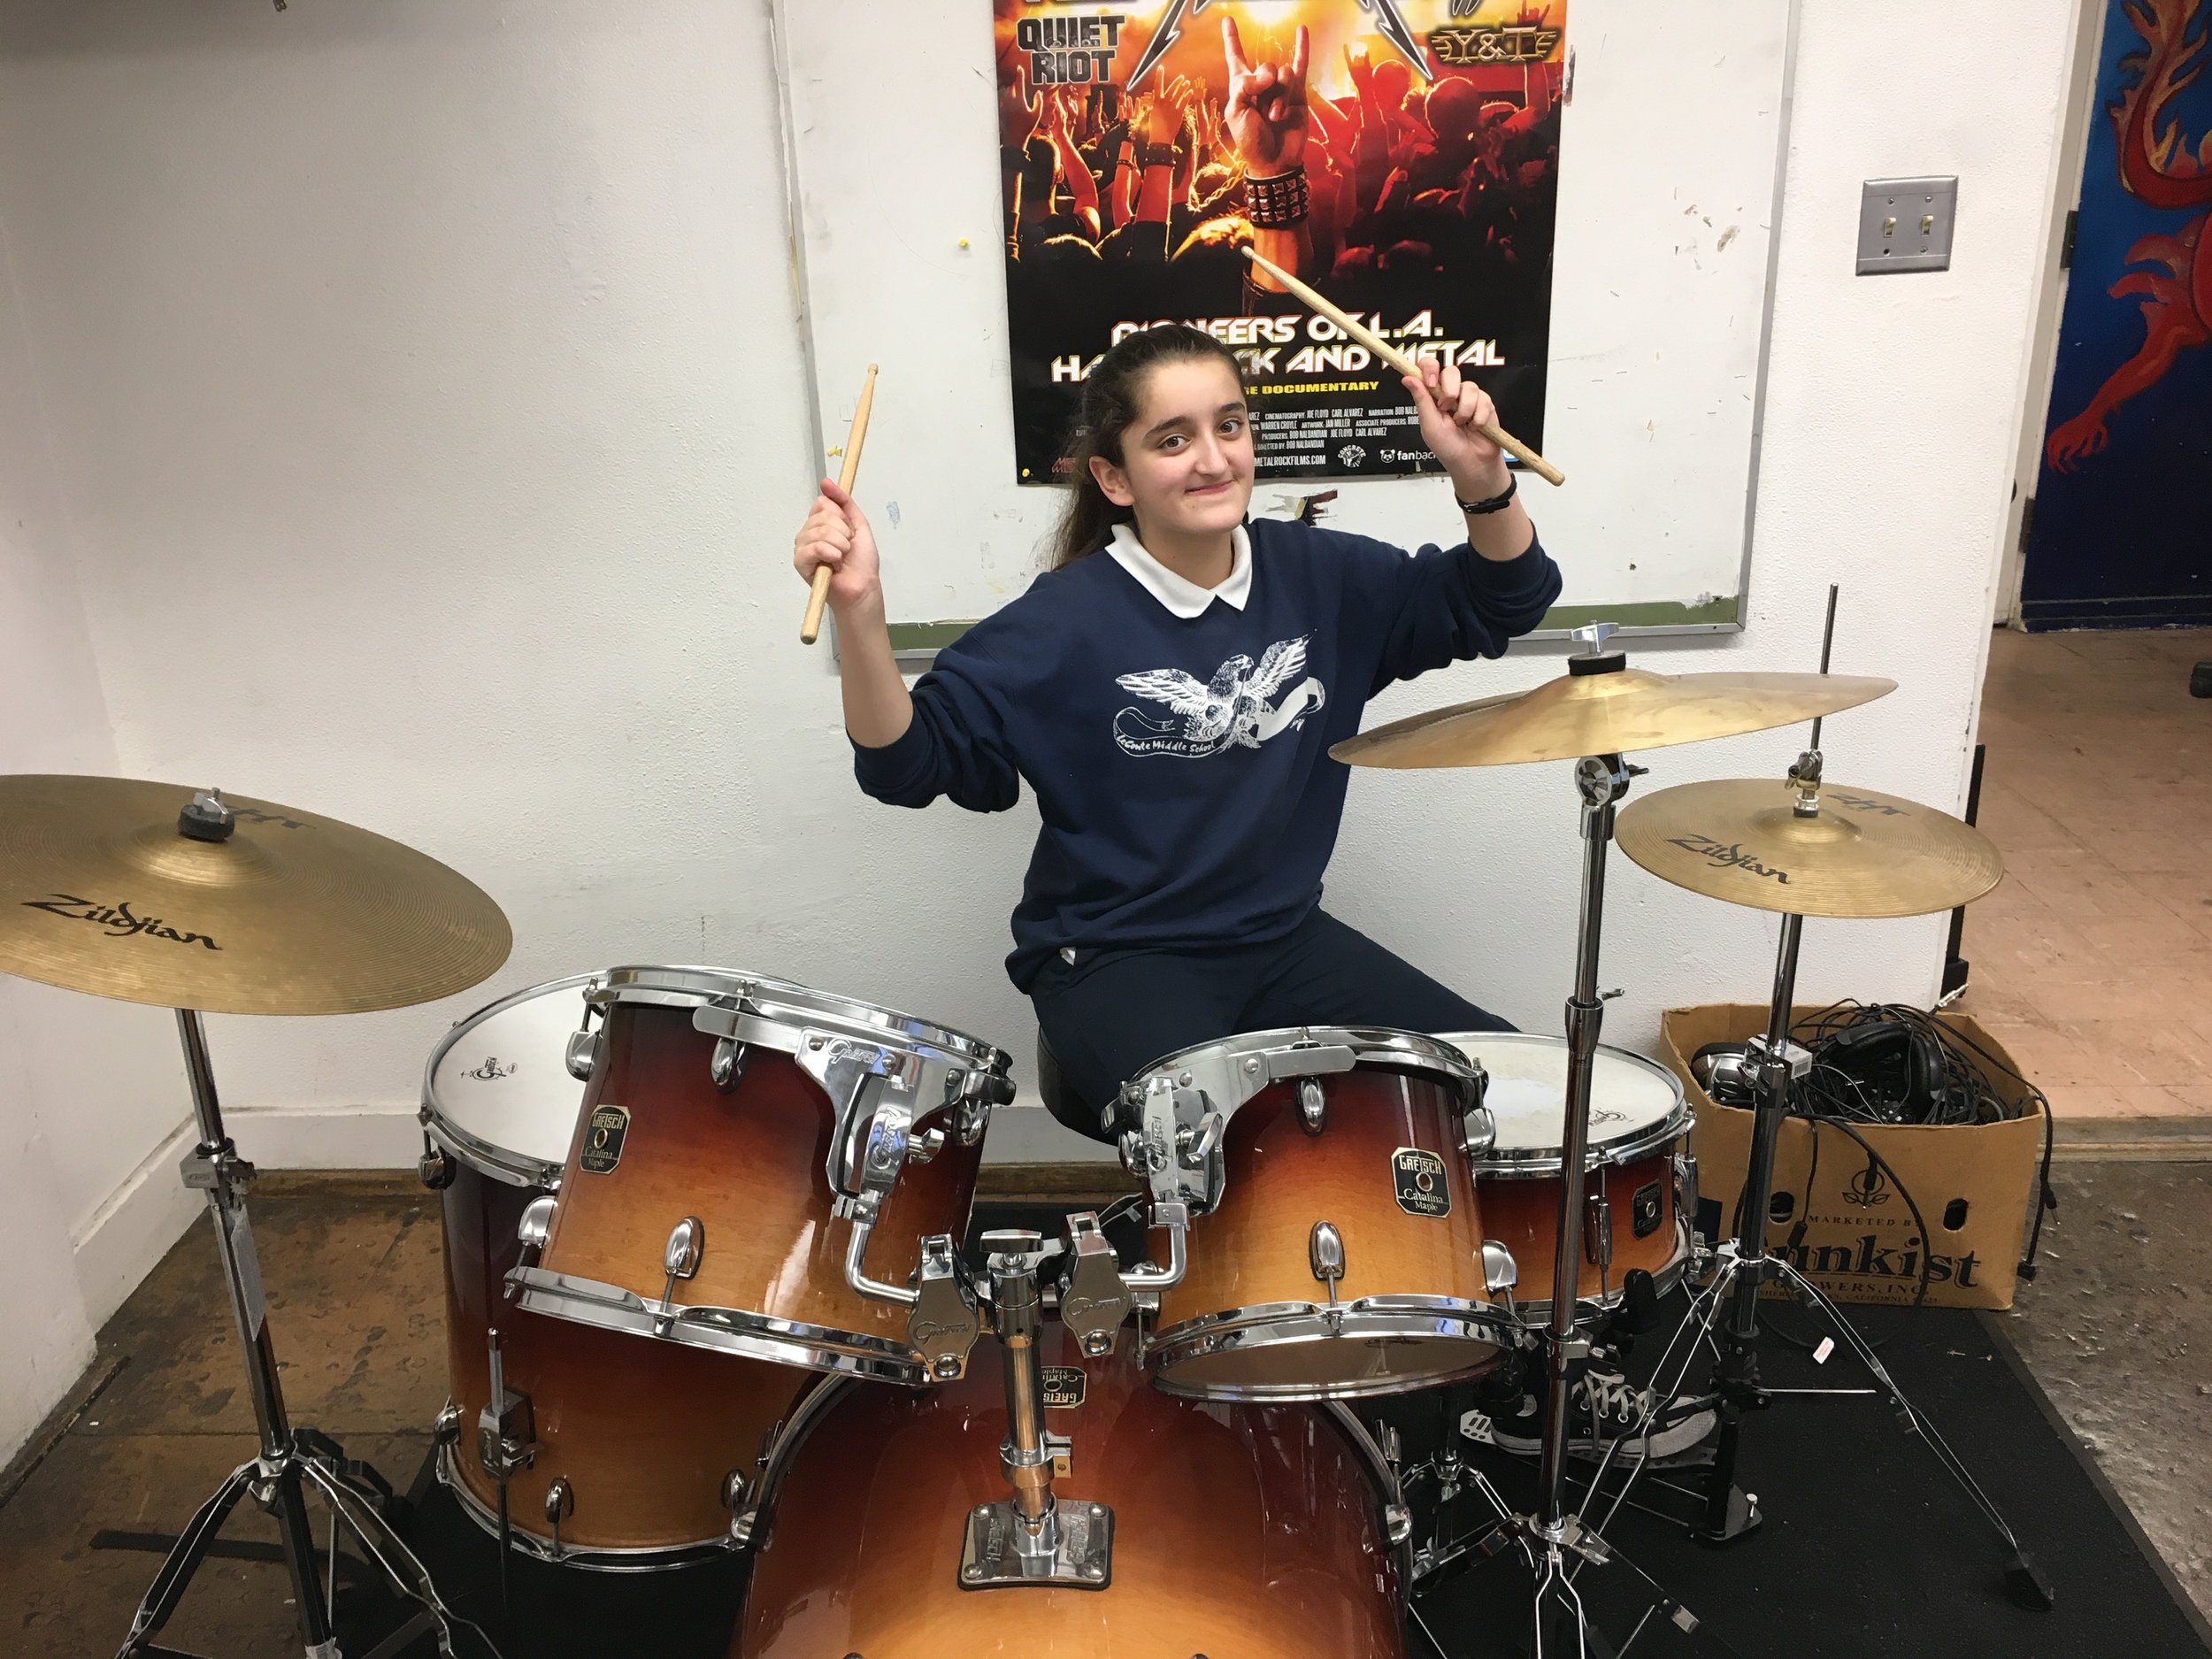 rock band girl at drums.jpg